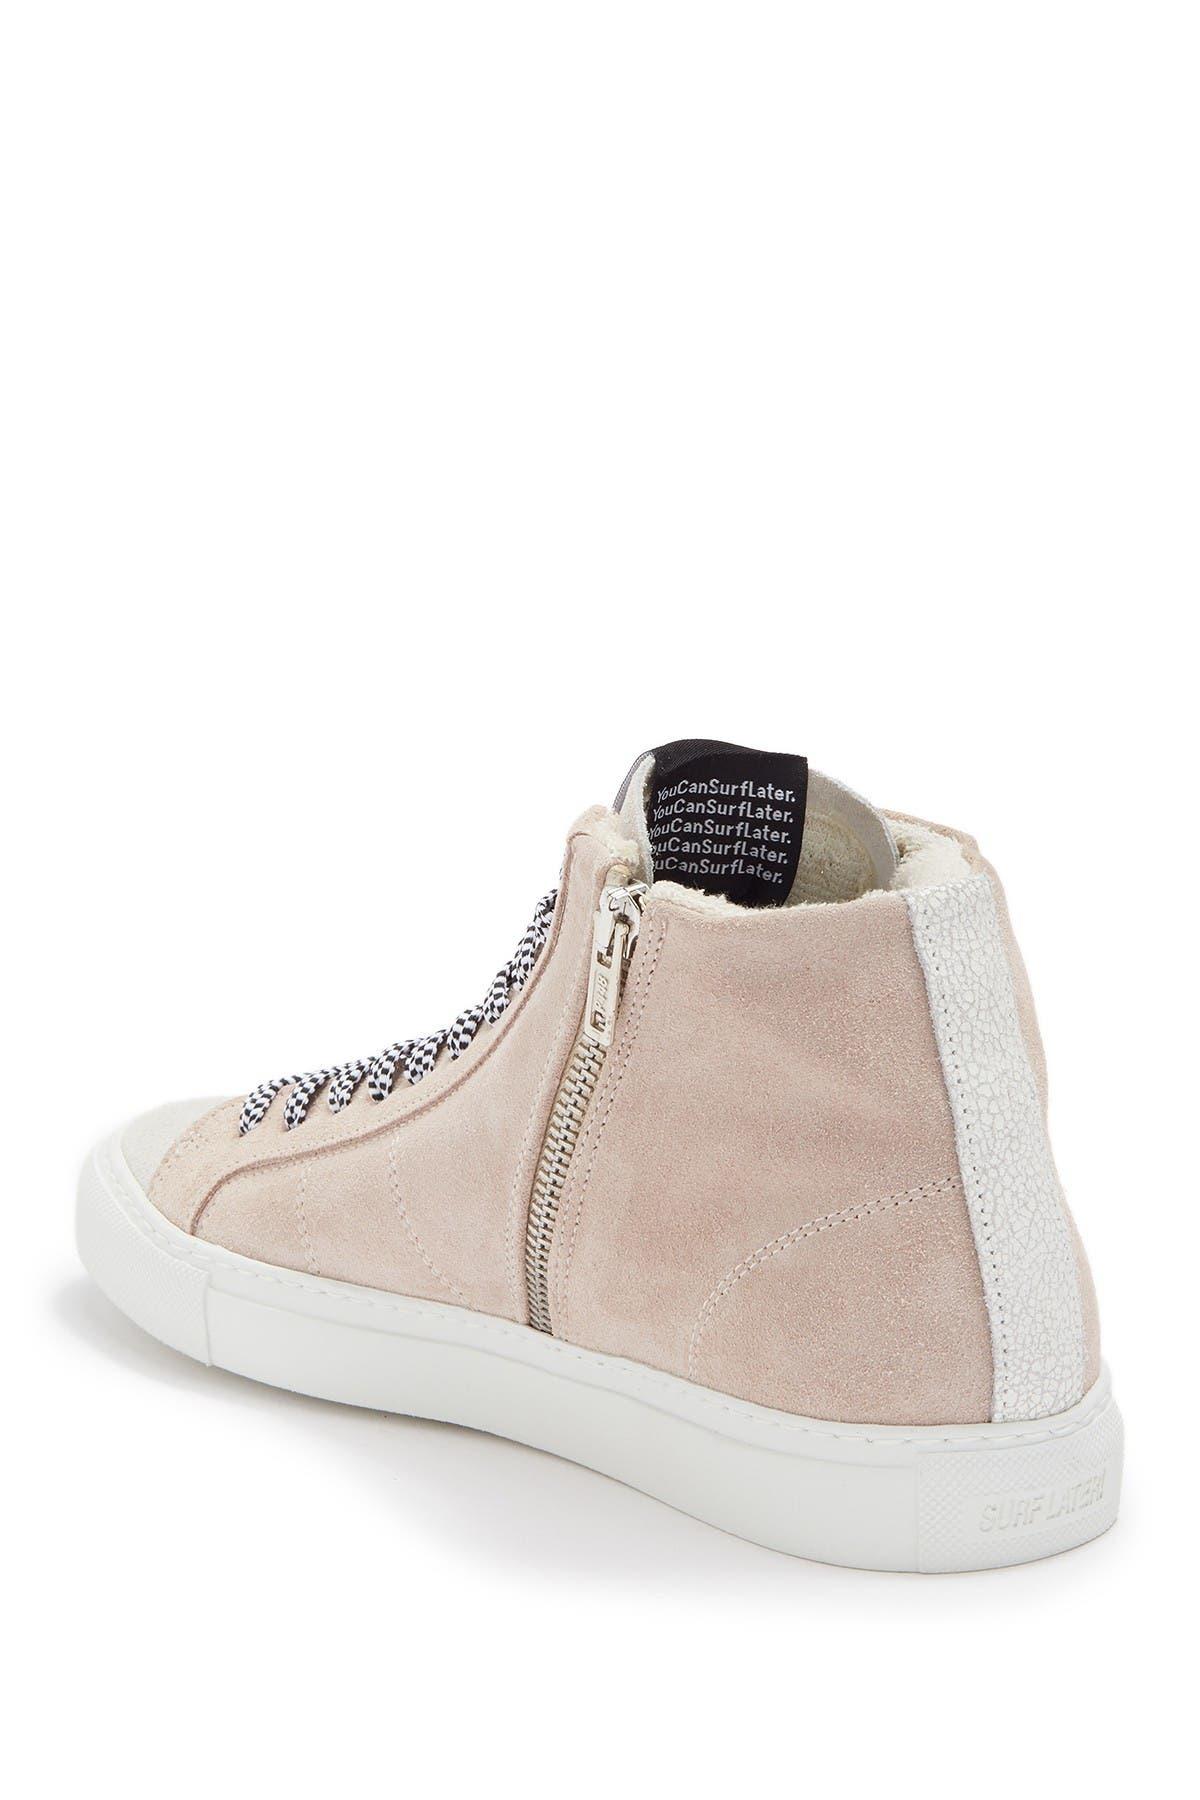 Image of P448 F9 Star 2.0 Sneaker